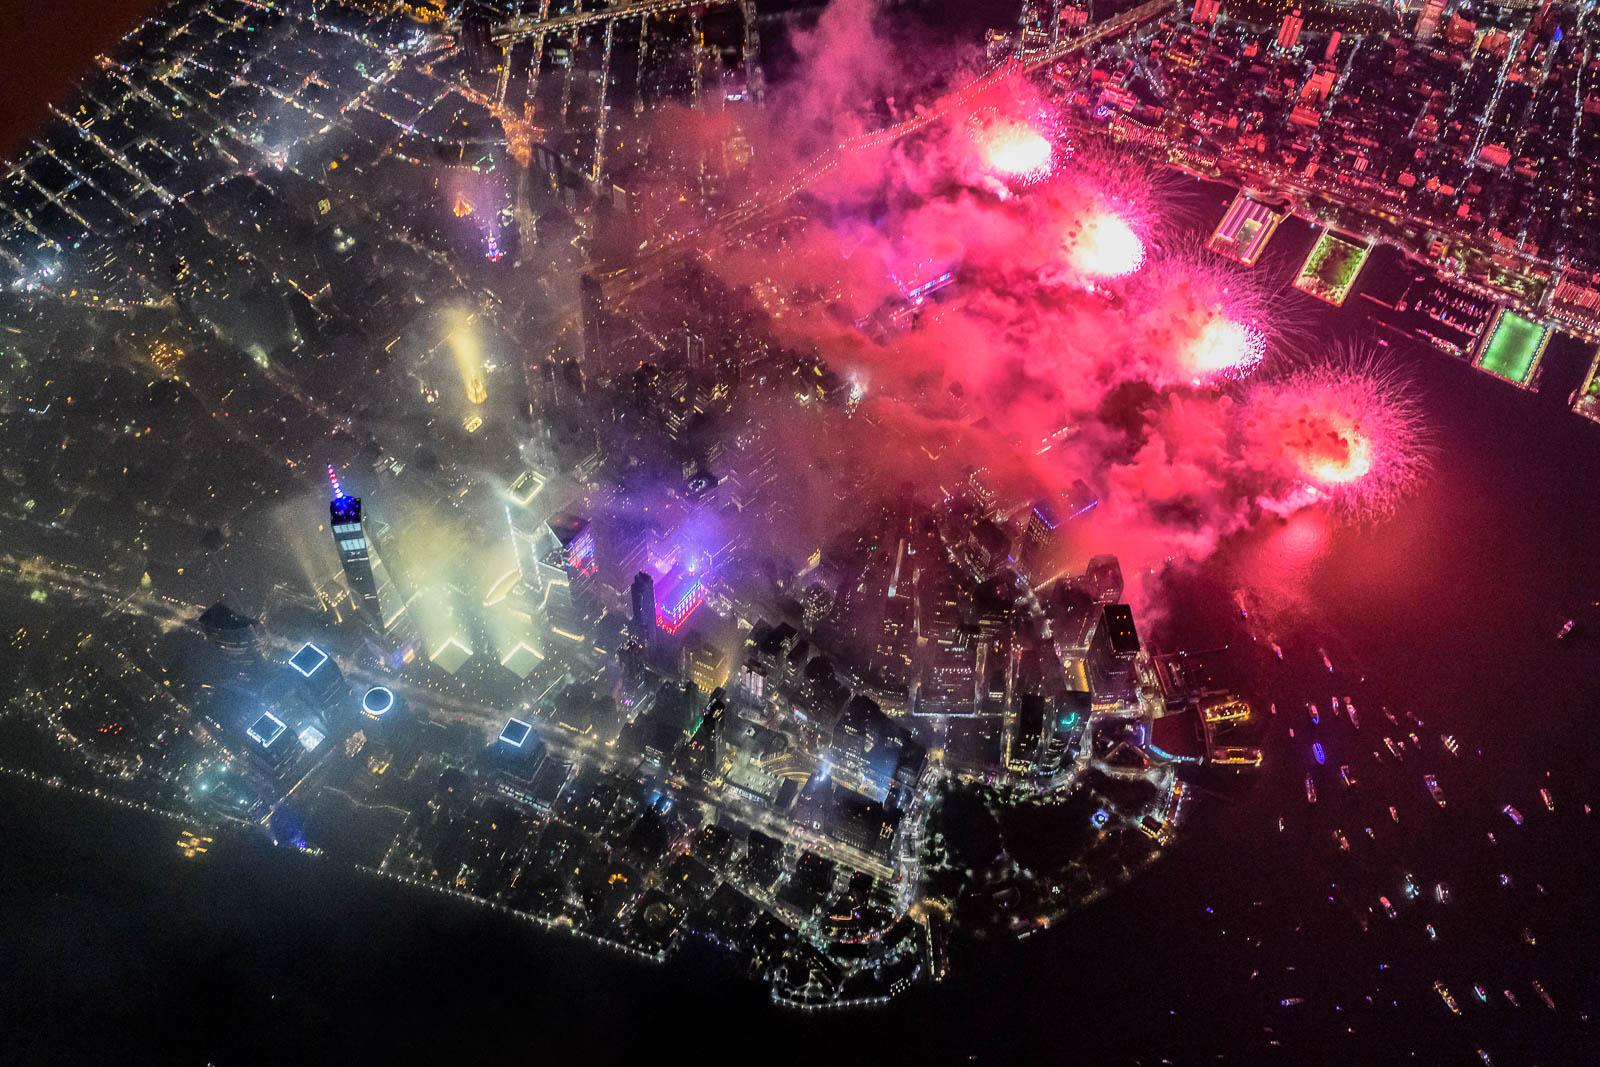 New York City July 4th Fireworks - HERO